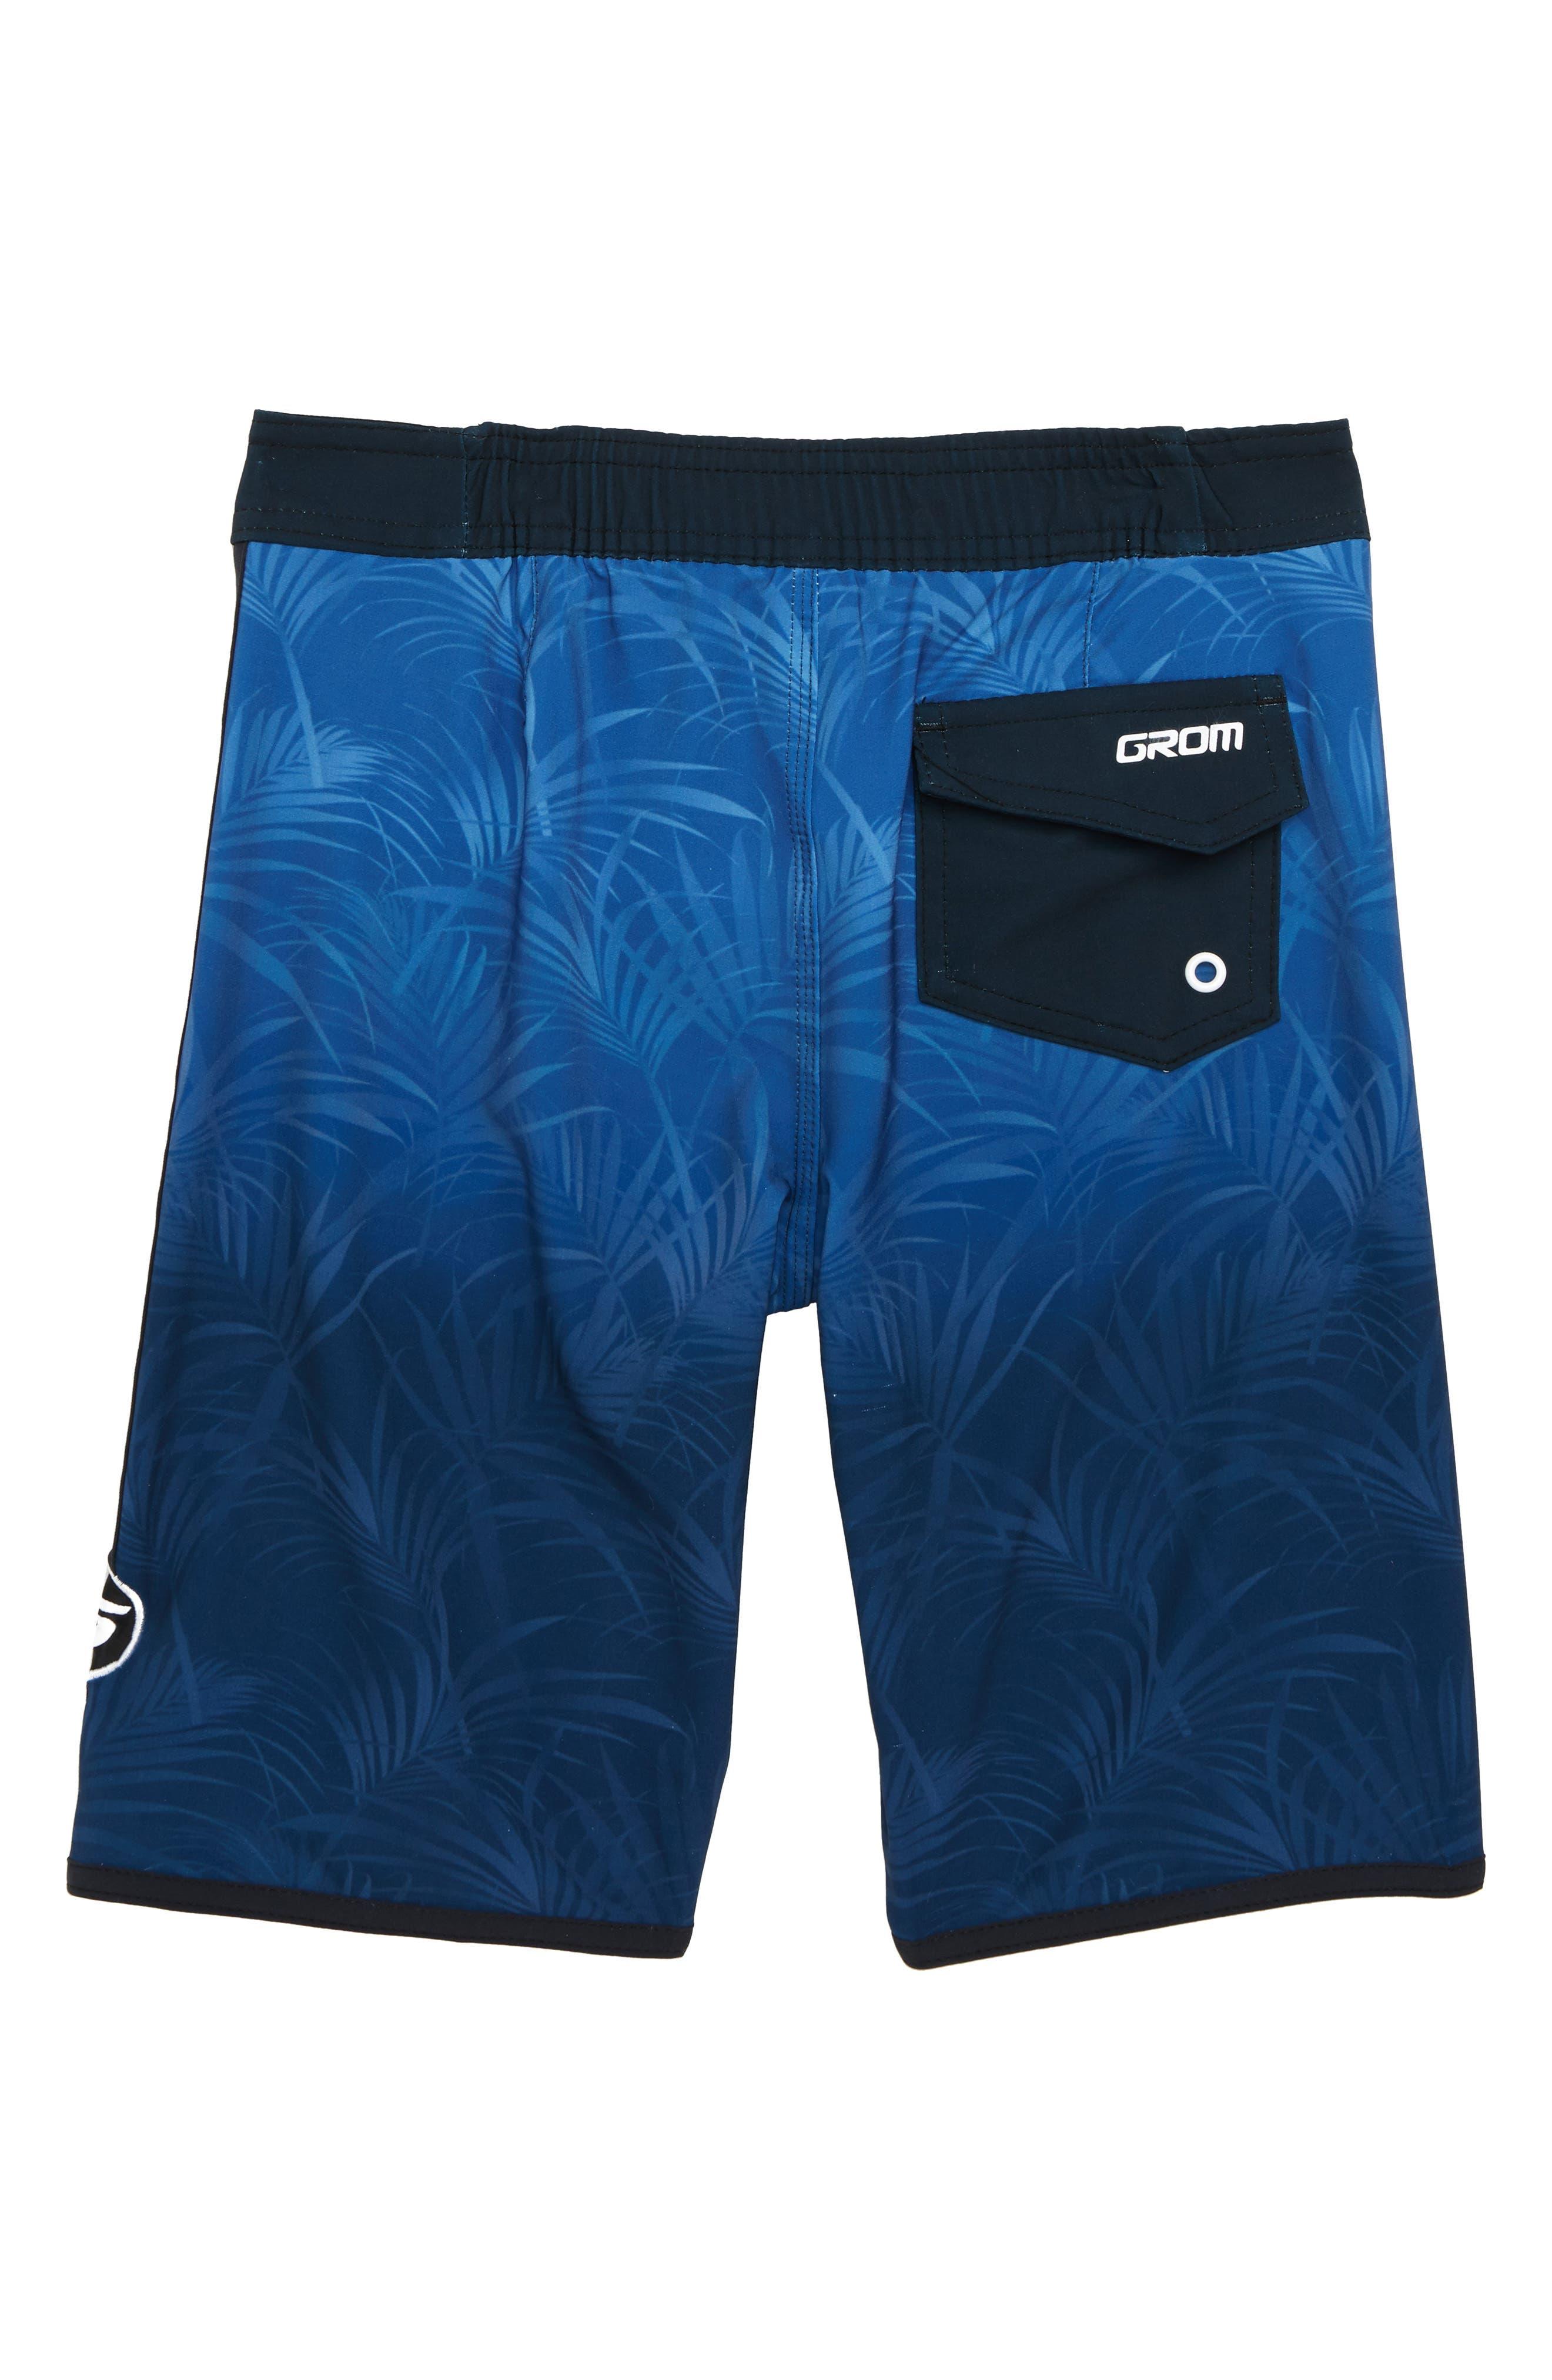 Palm Fade Board Shorts,                             Alternate thumbnail 2, color,                             BLUE